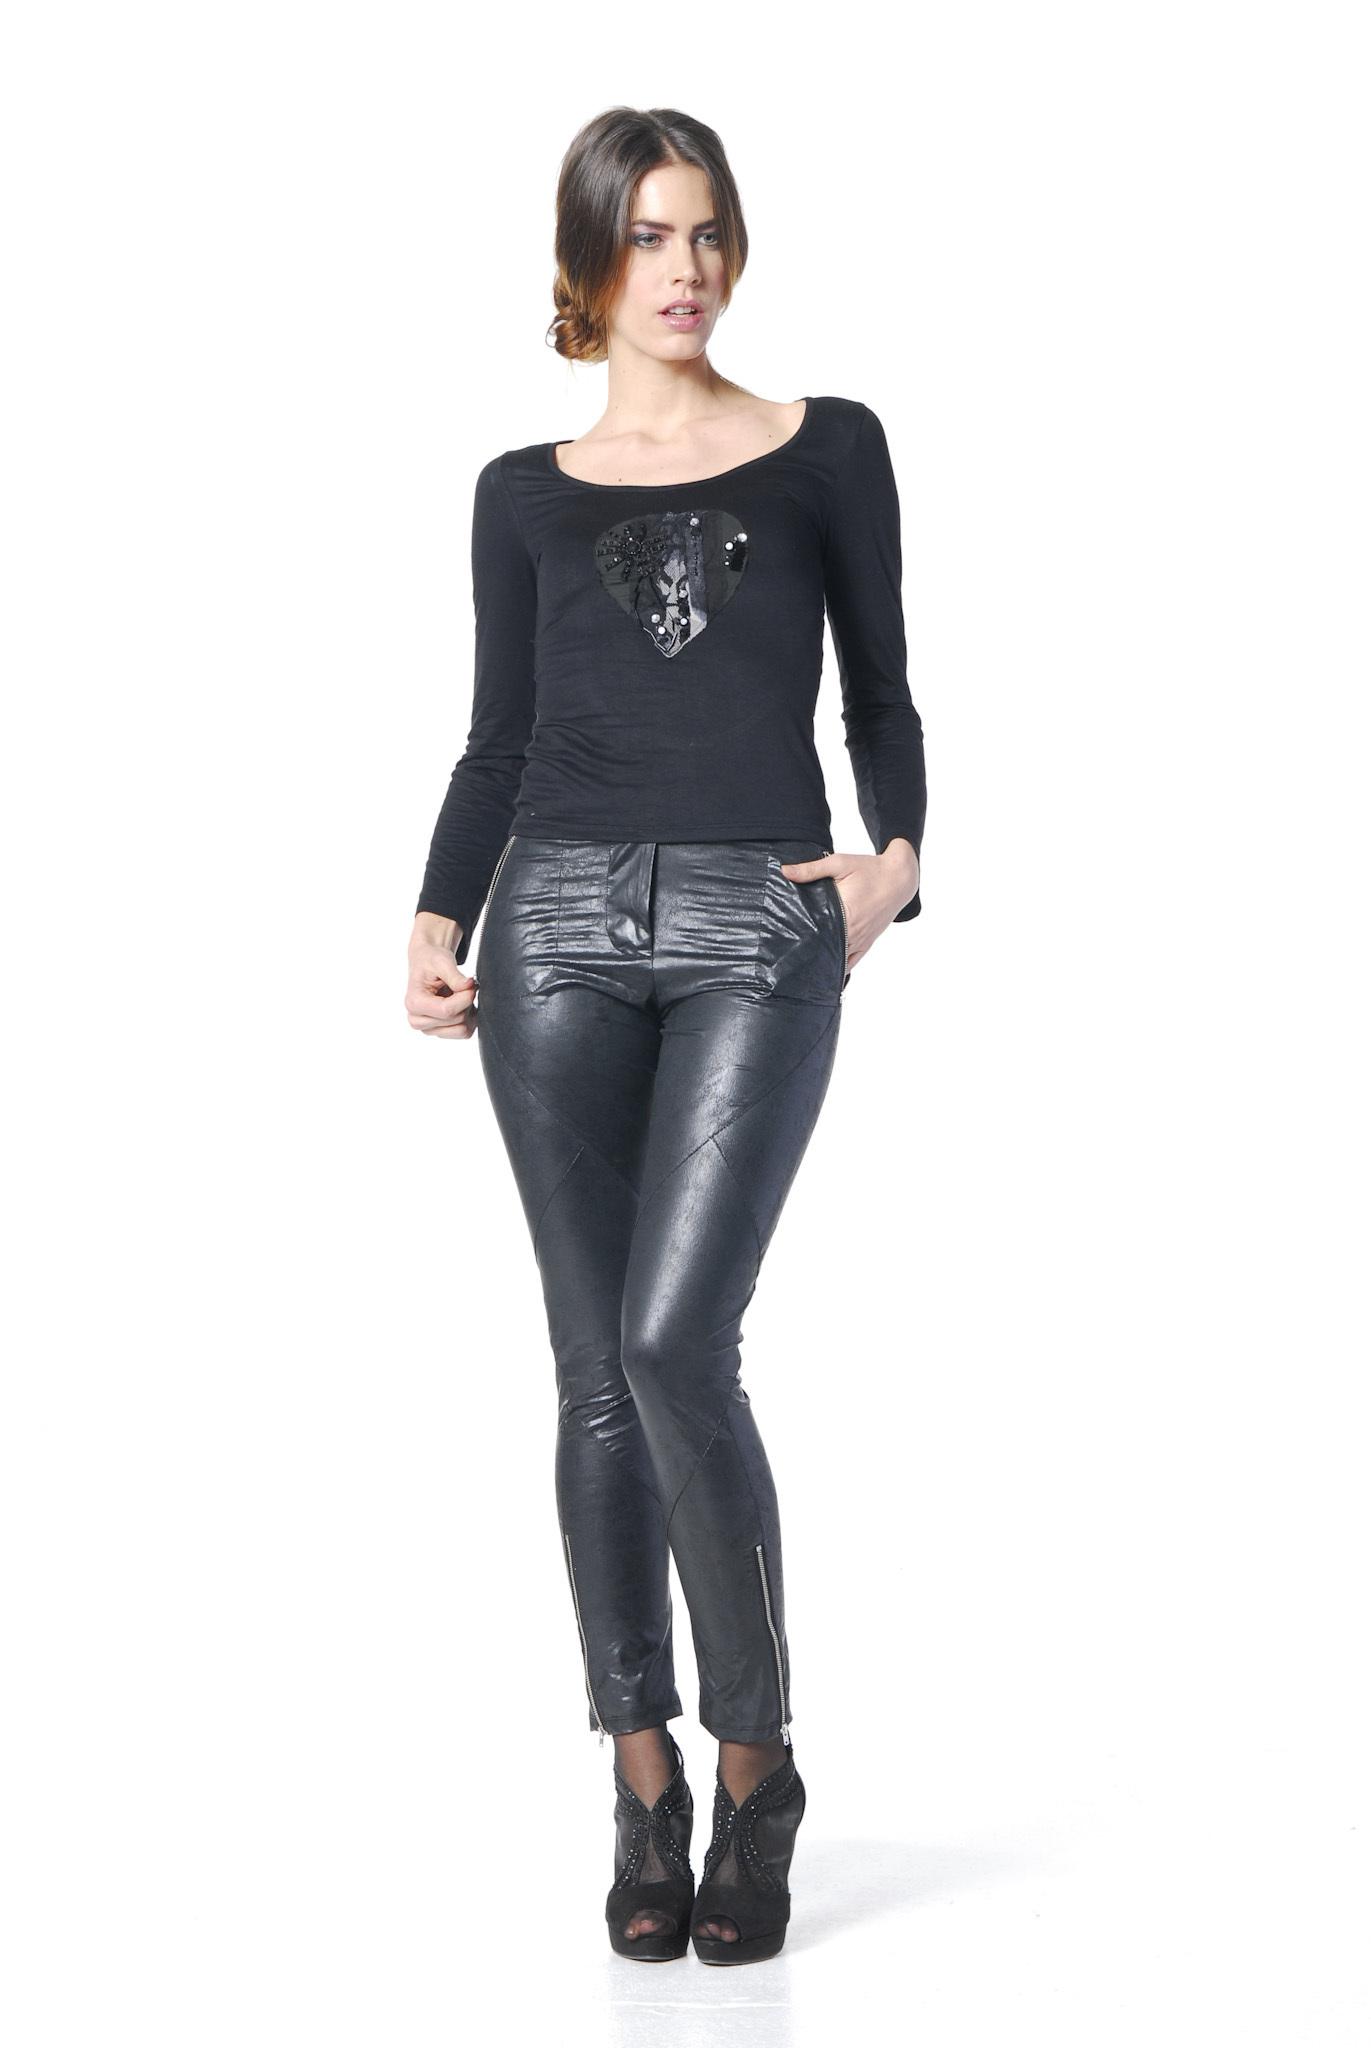 Les Fees Du Vent Couture: Crystal Keyhole Top